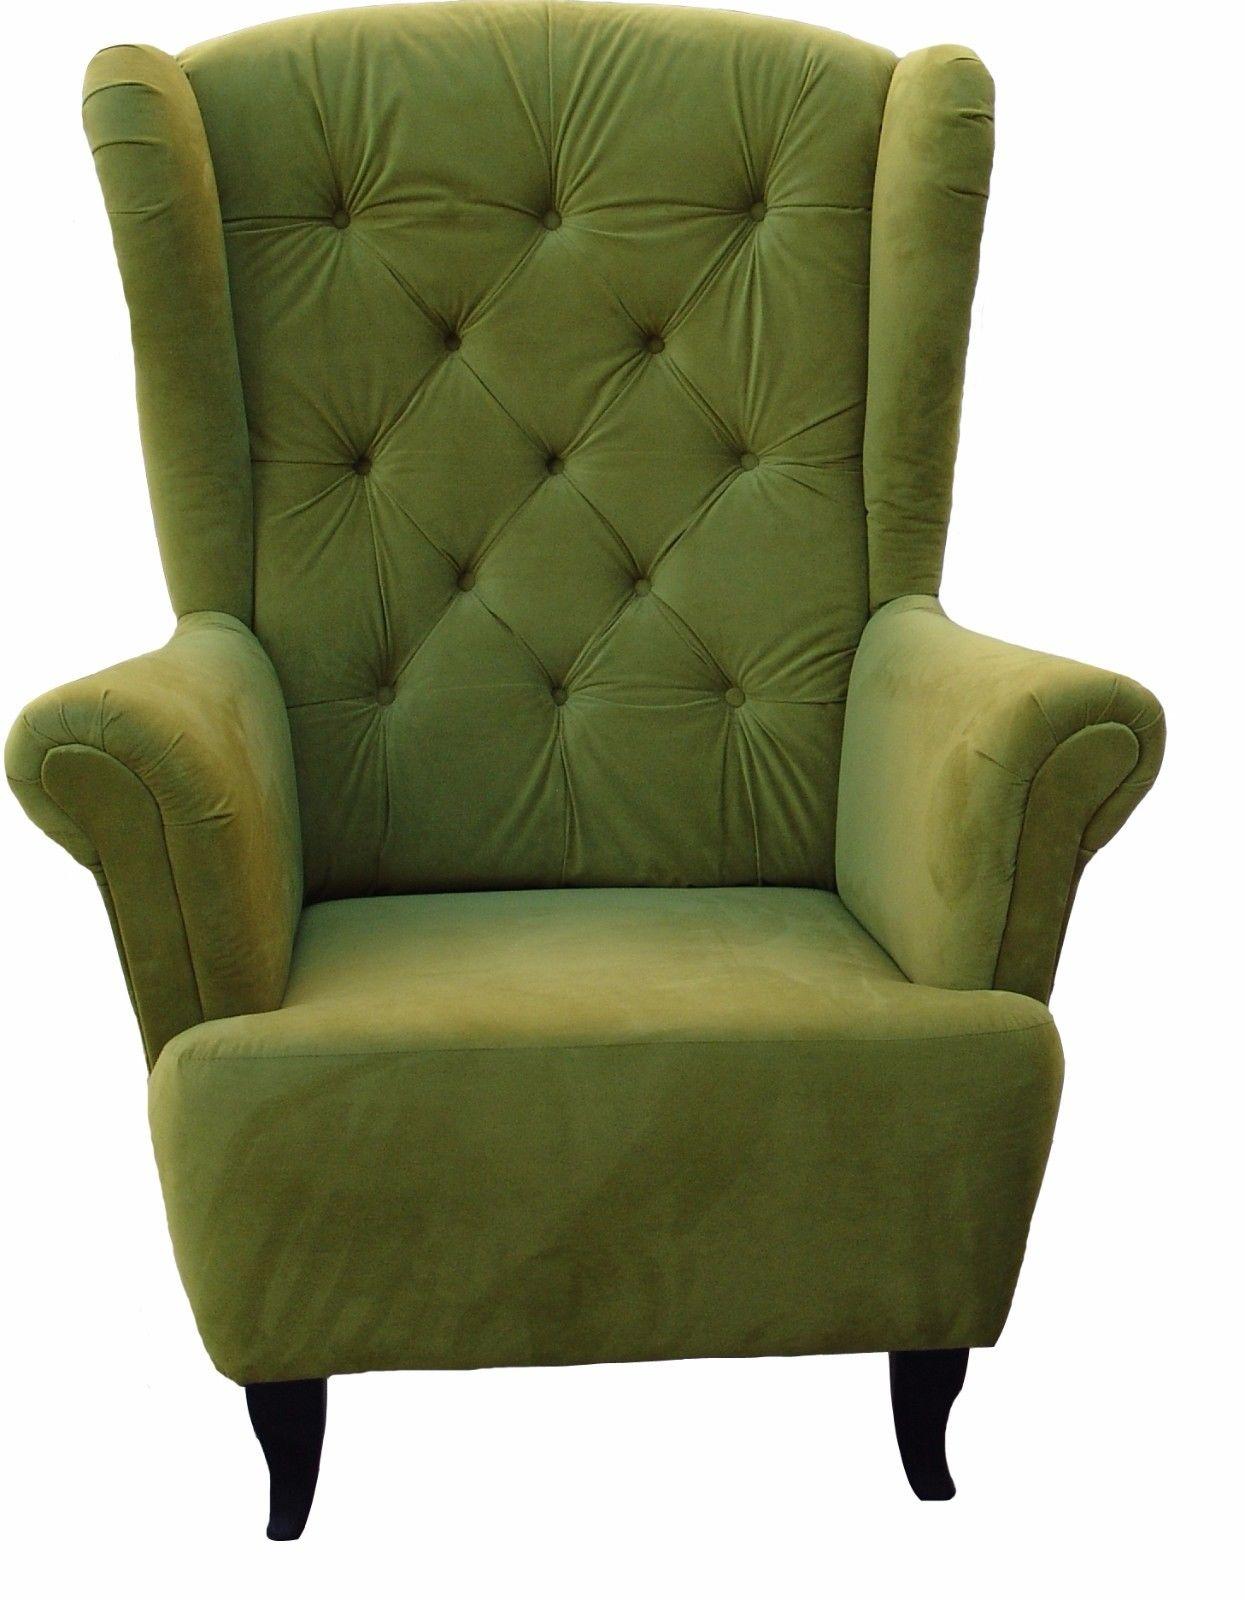 Sessel ohrensessel wohnzimmersessel orlando webstoff for 0hren sessel